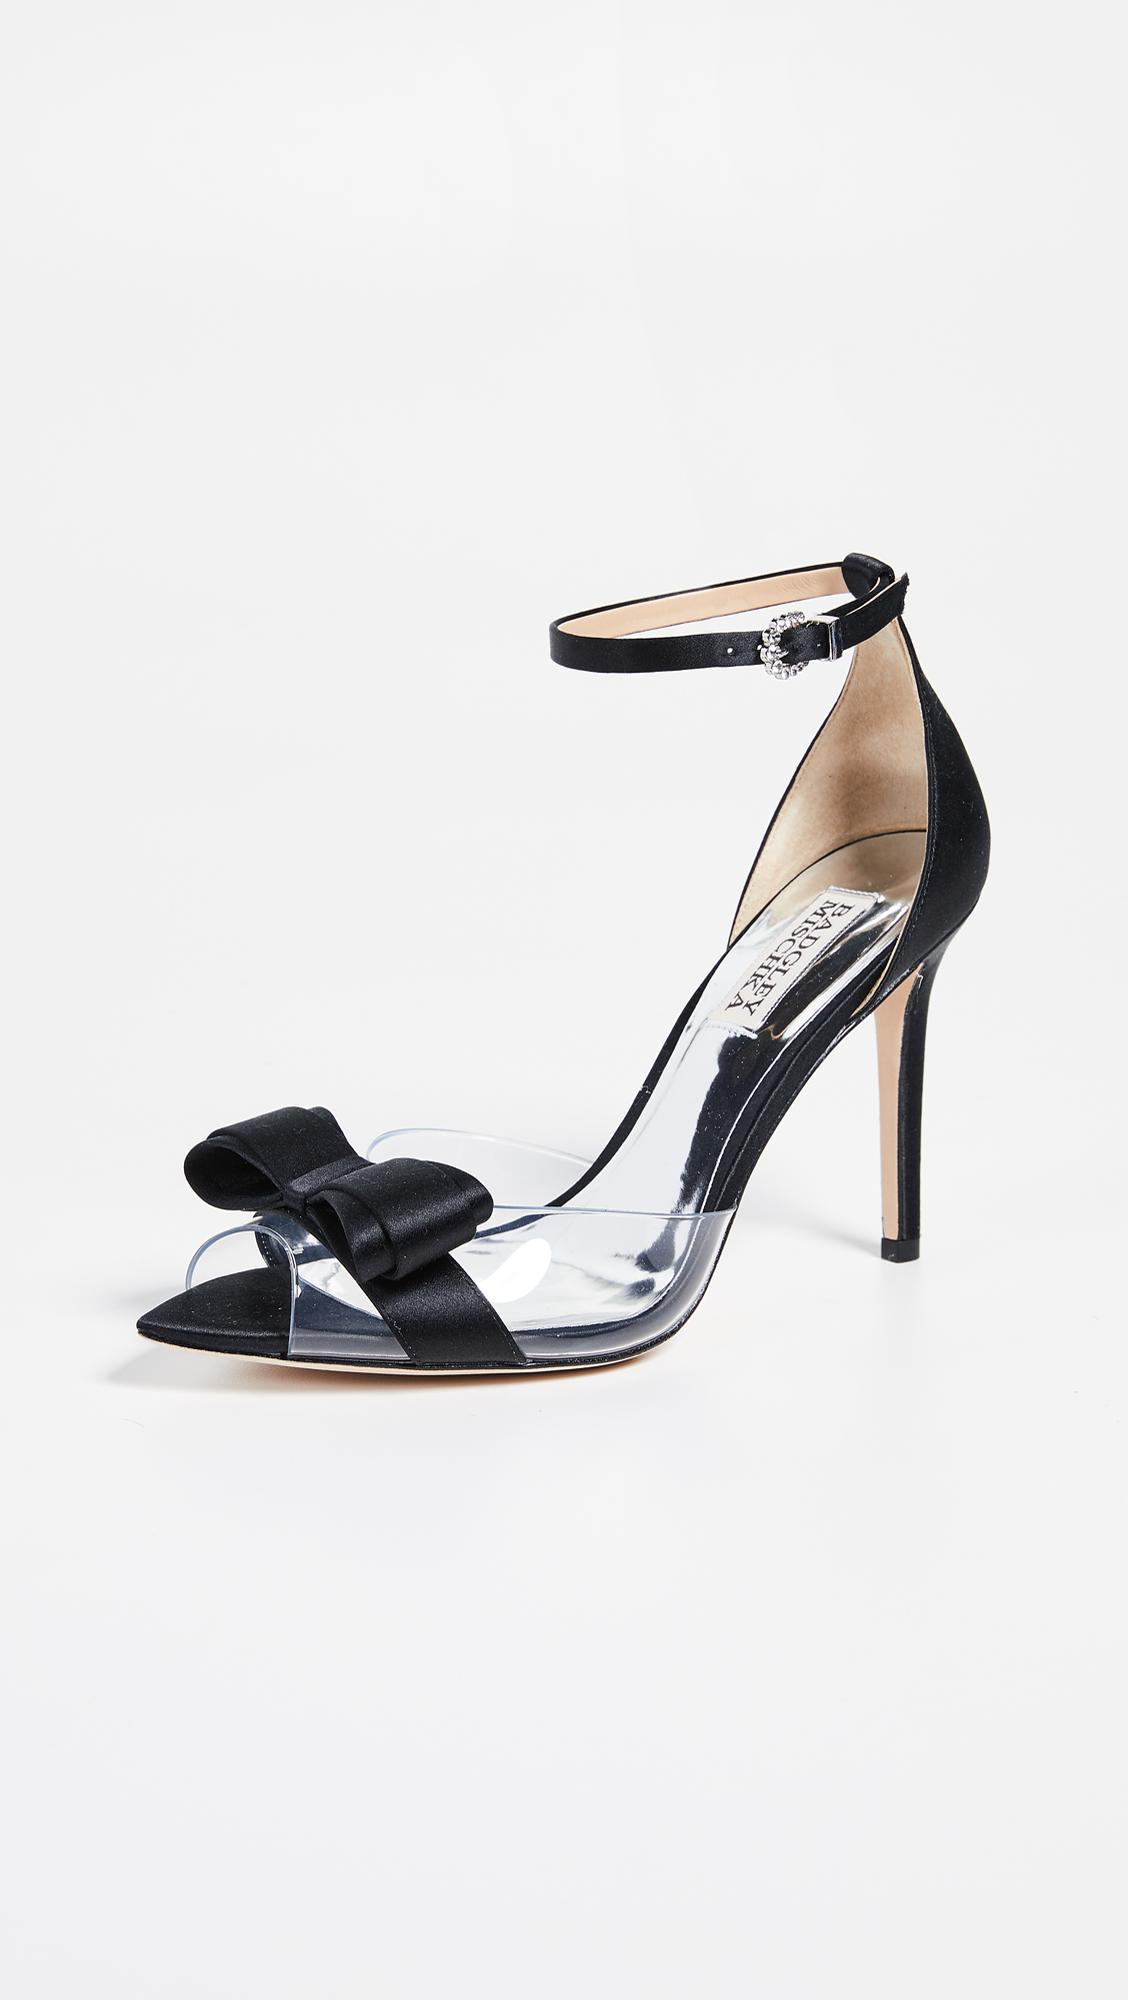 d99f128f12 Badgley Mischka Lindsay Vinyl Ankle Strap Sandals in Black - Lyst